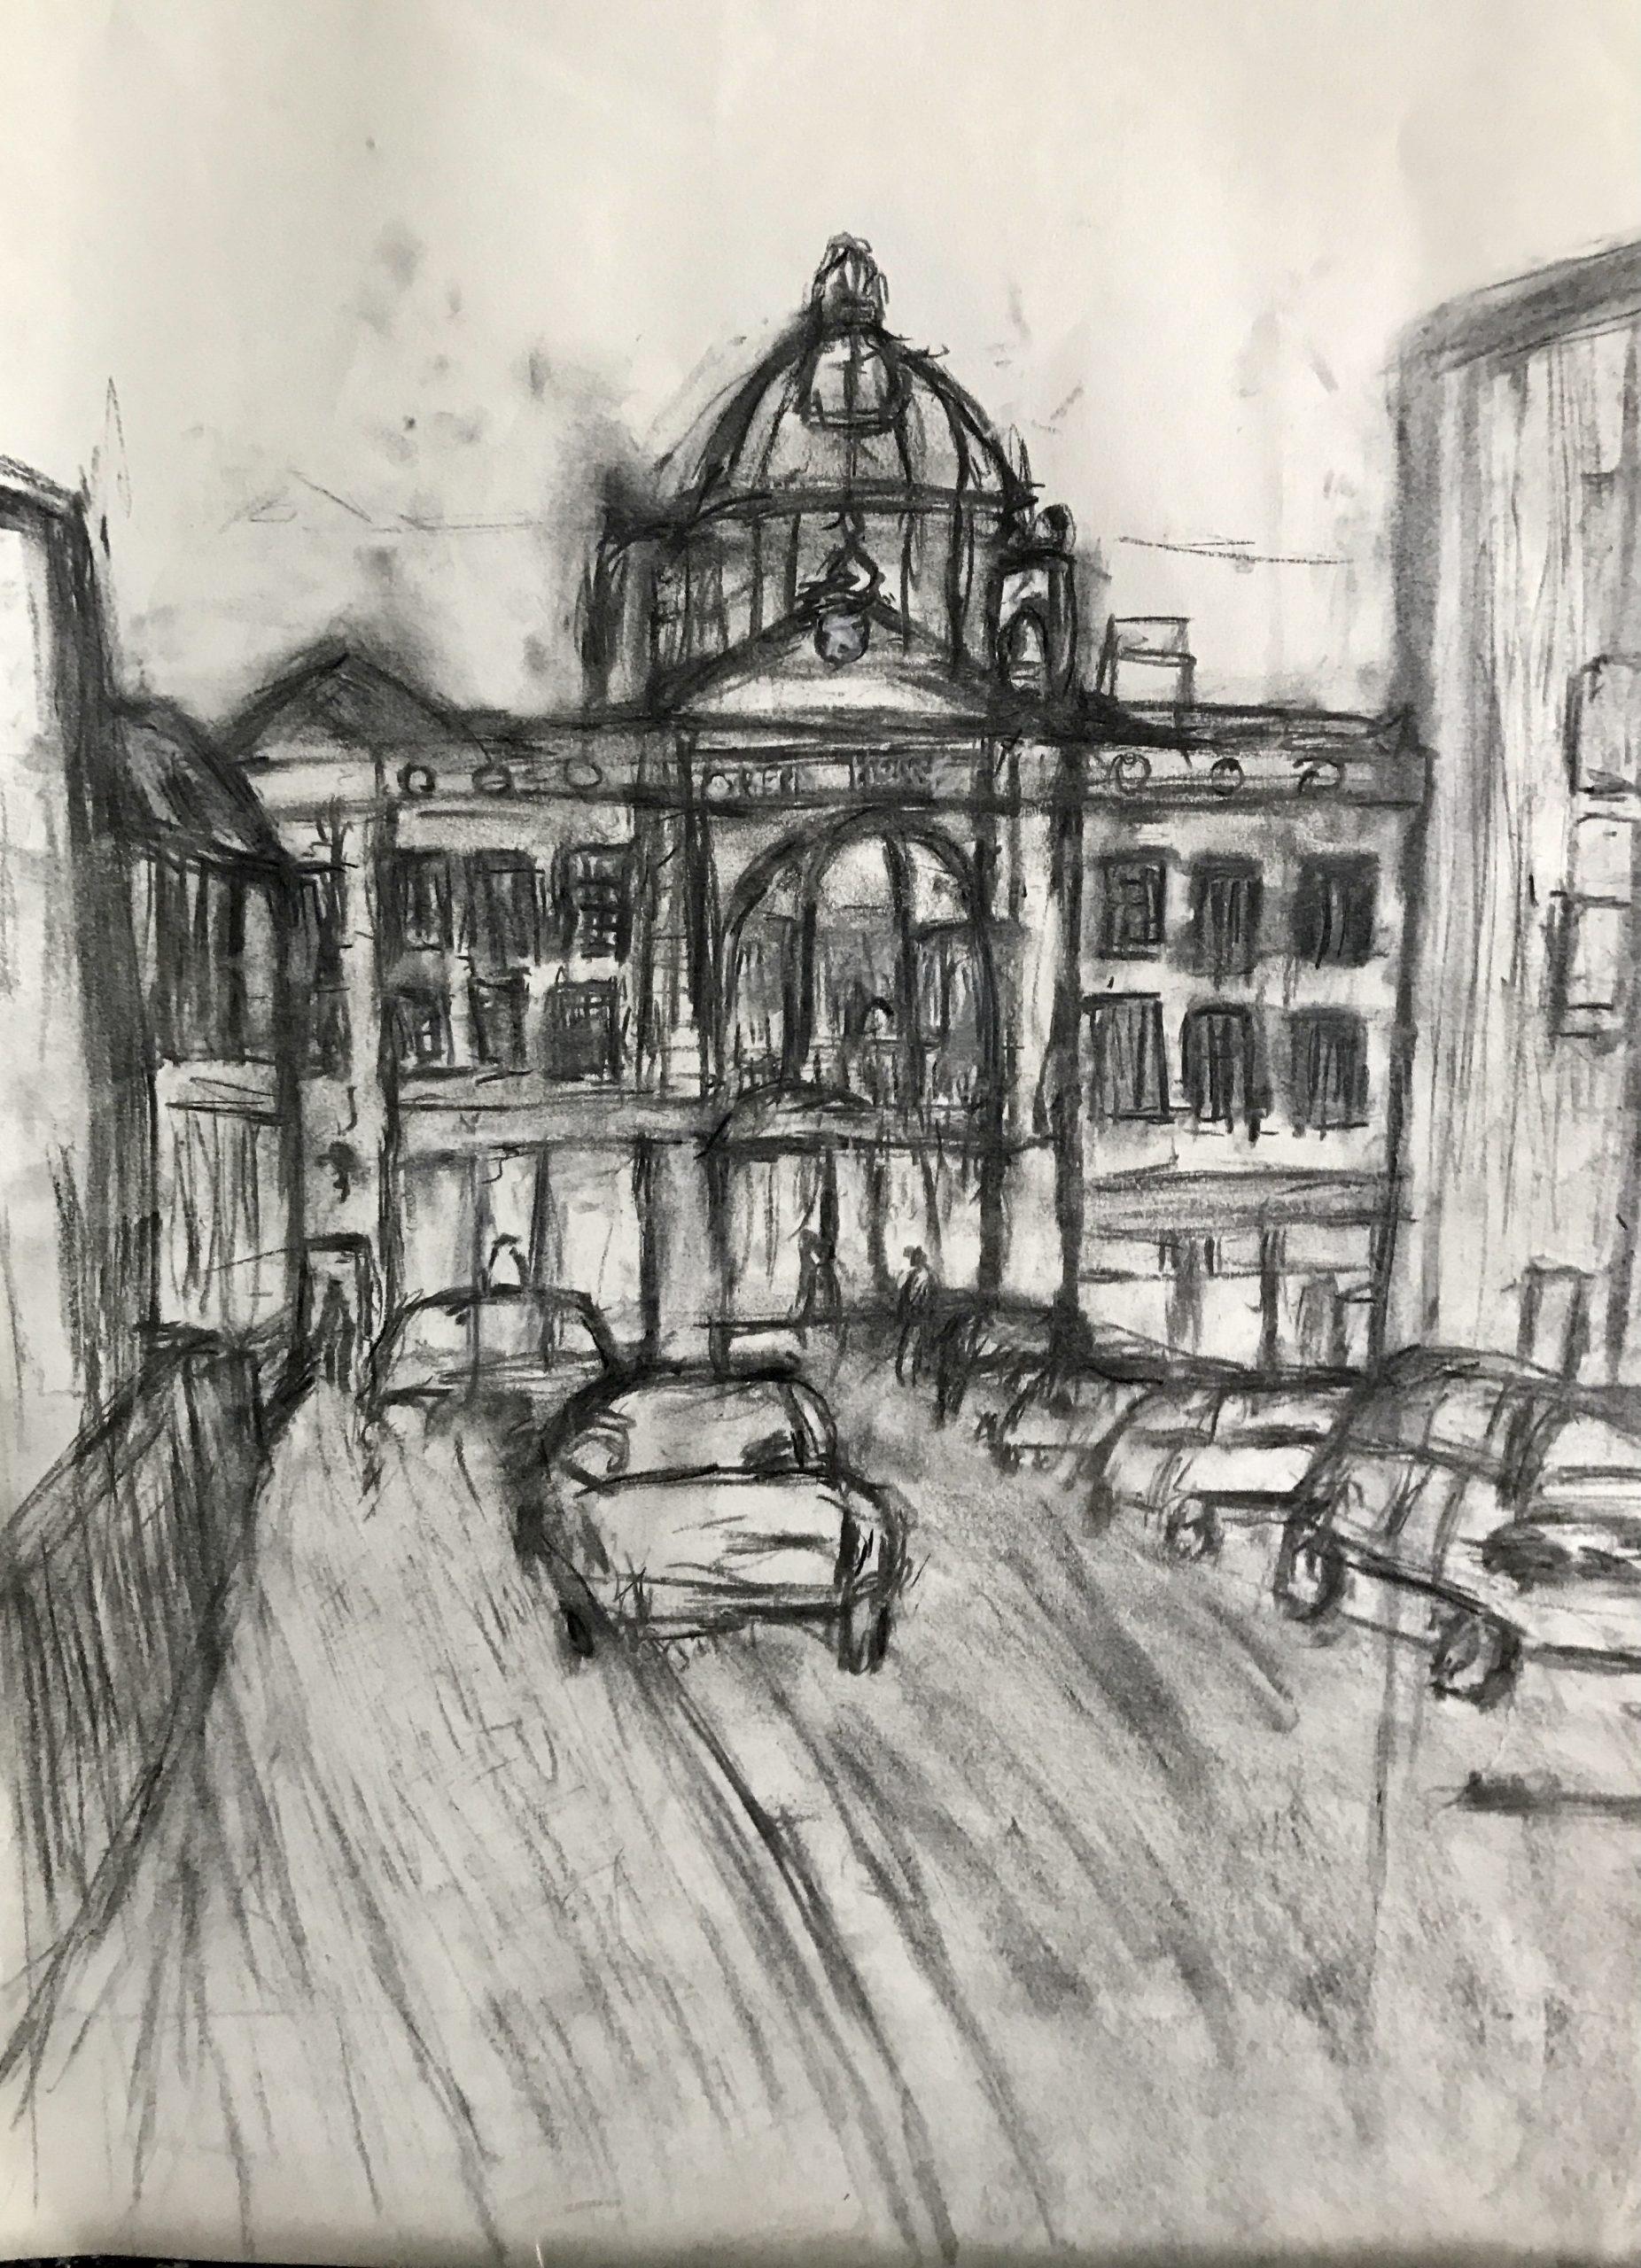 Opera House pub